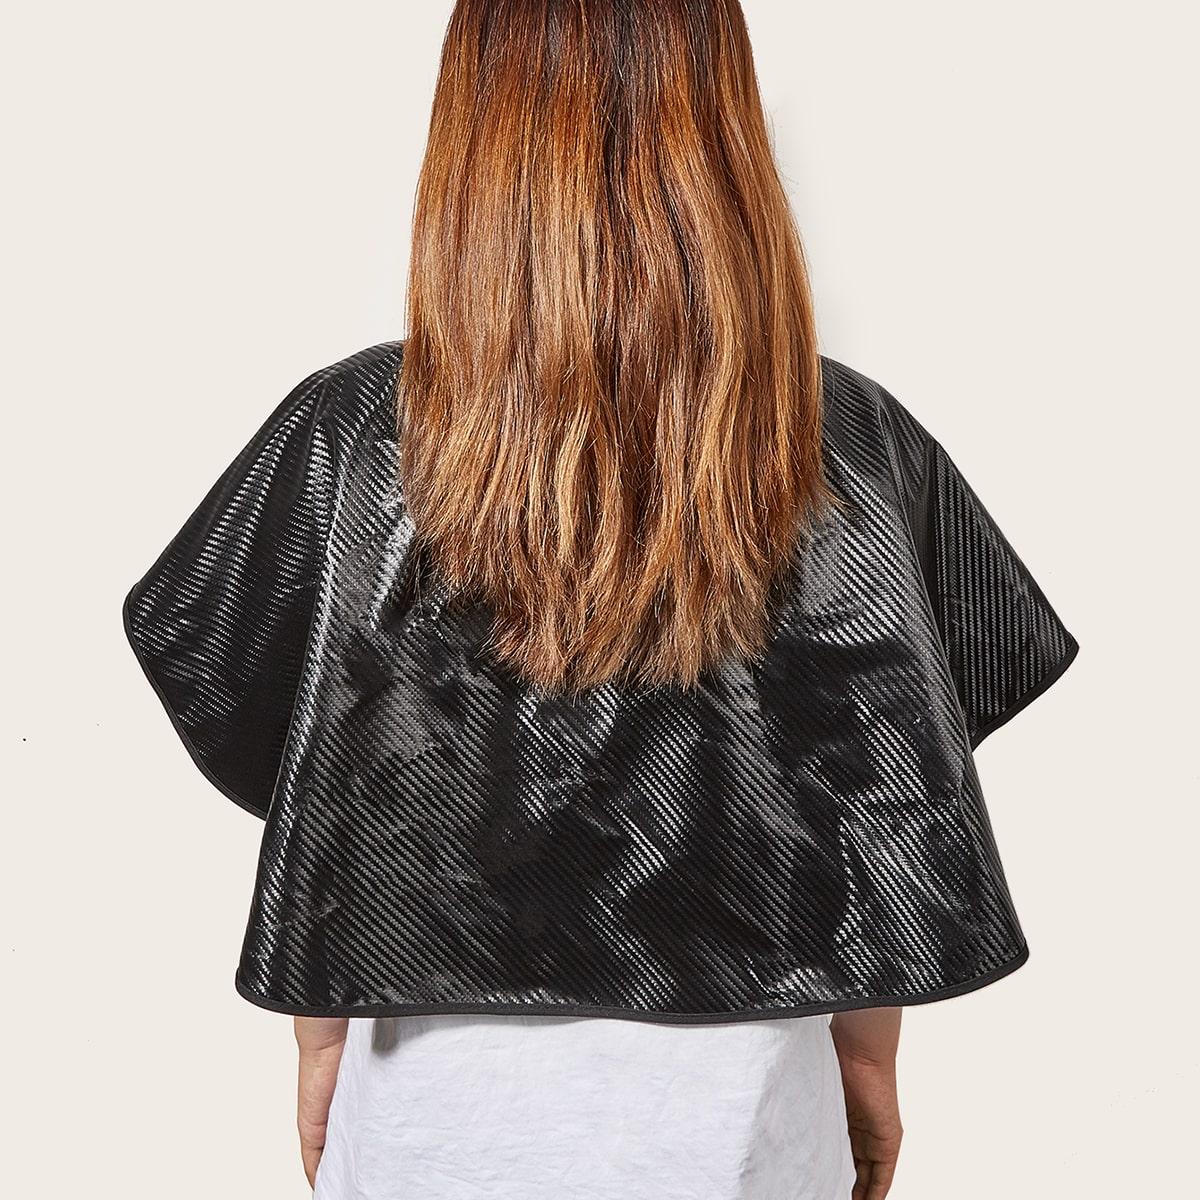 Waterproof Hair Dye Shawl